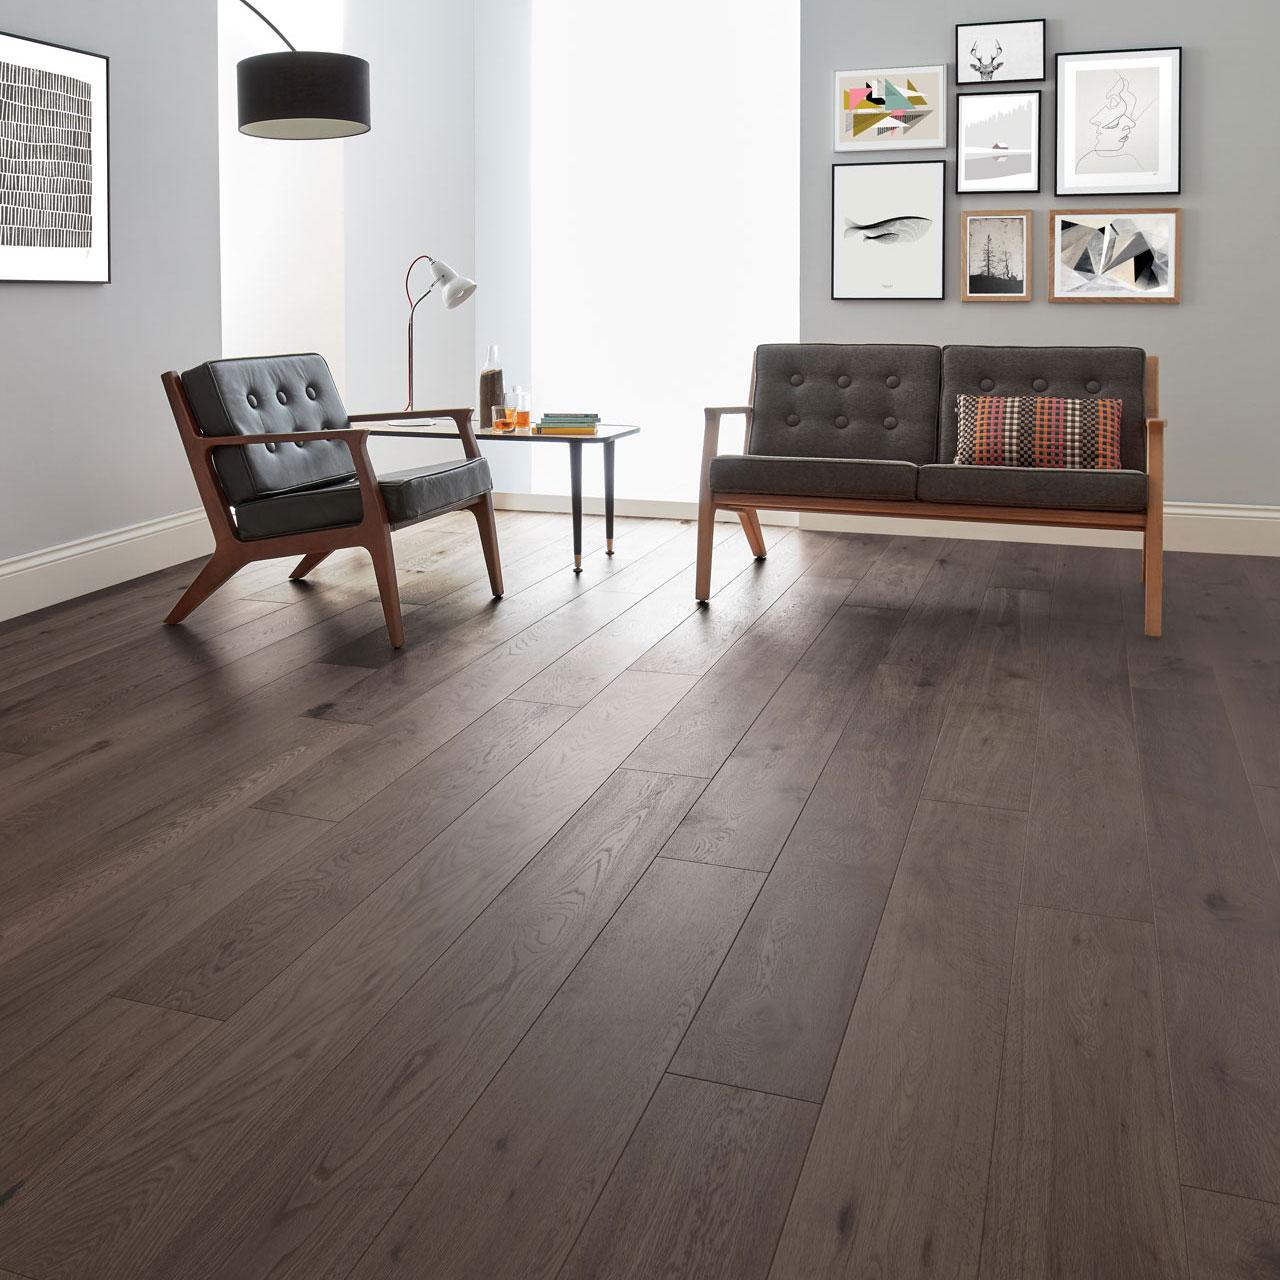 salcombe shadow oak flooring